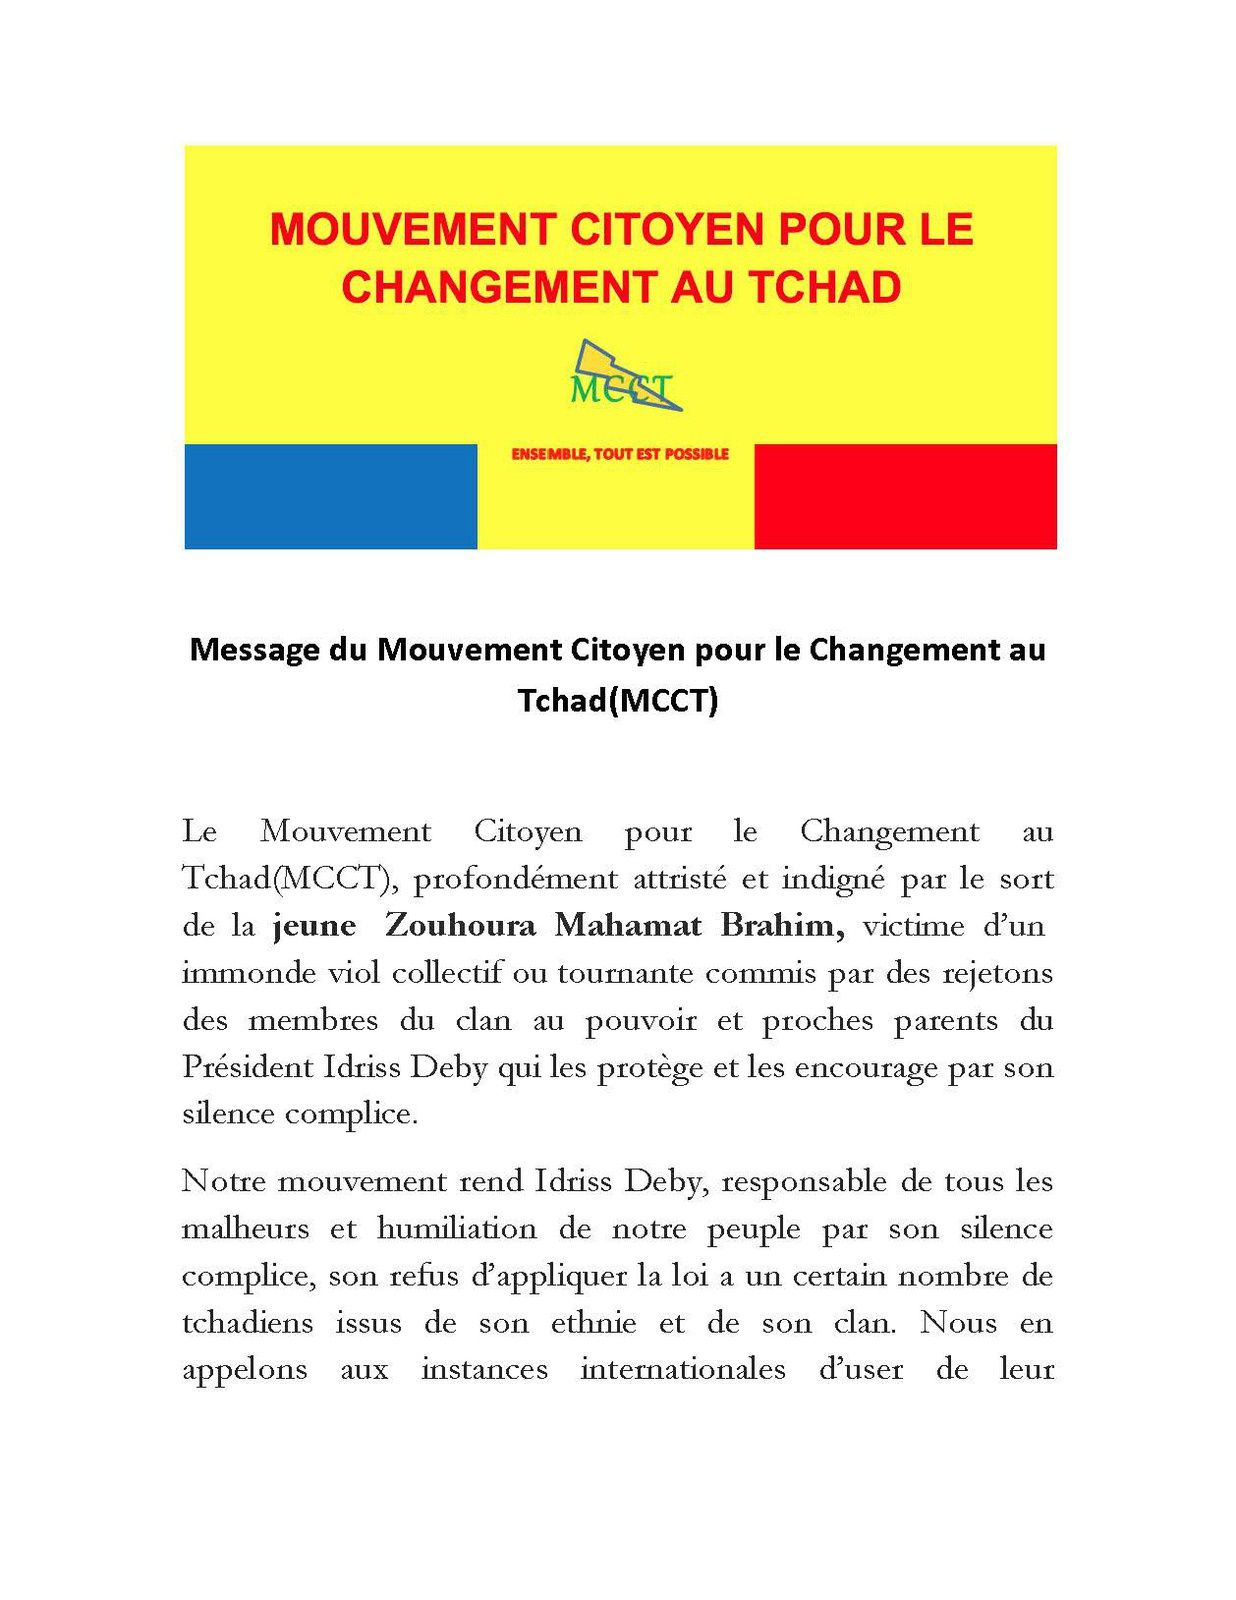 Viol de Zouhoura Mahamat Brahim au Tchad: le MCCT indigné